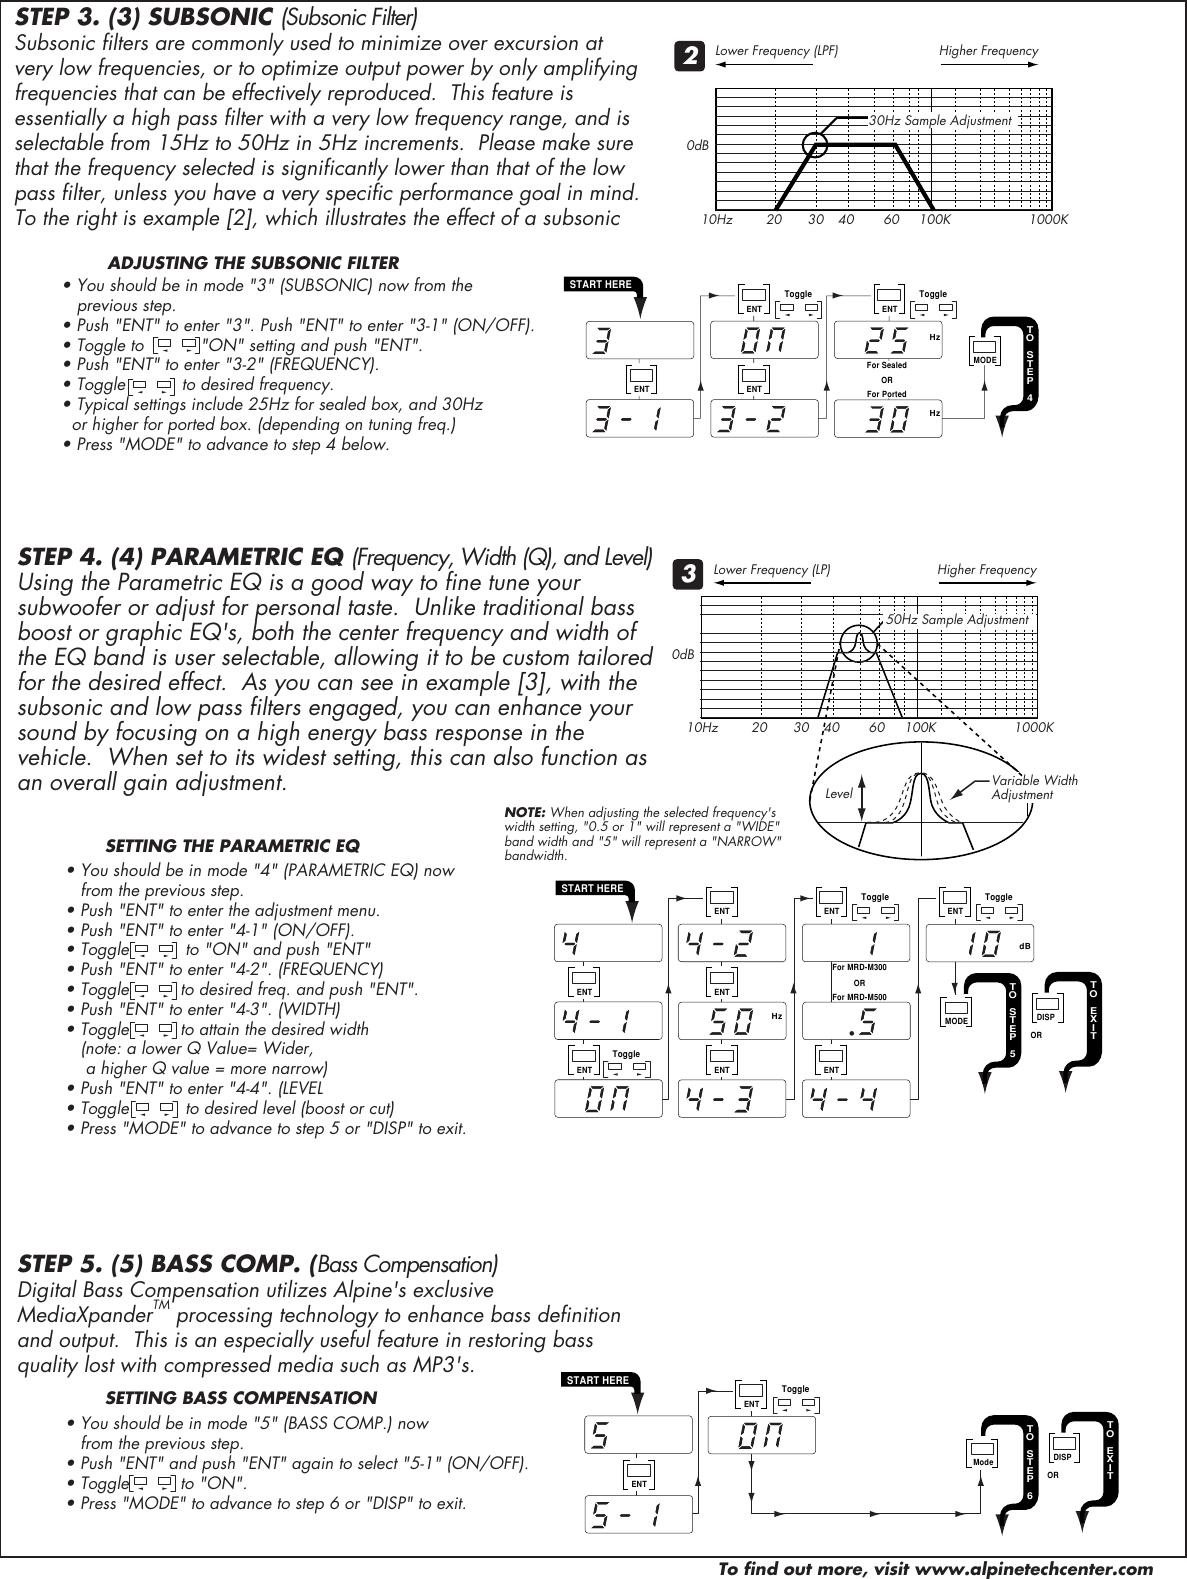 Alpine MRD M300 User Manual To The C0710314 9141 49c1 b761